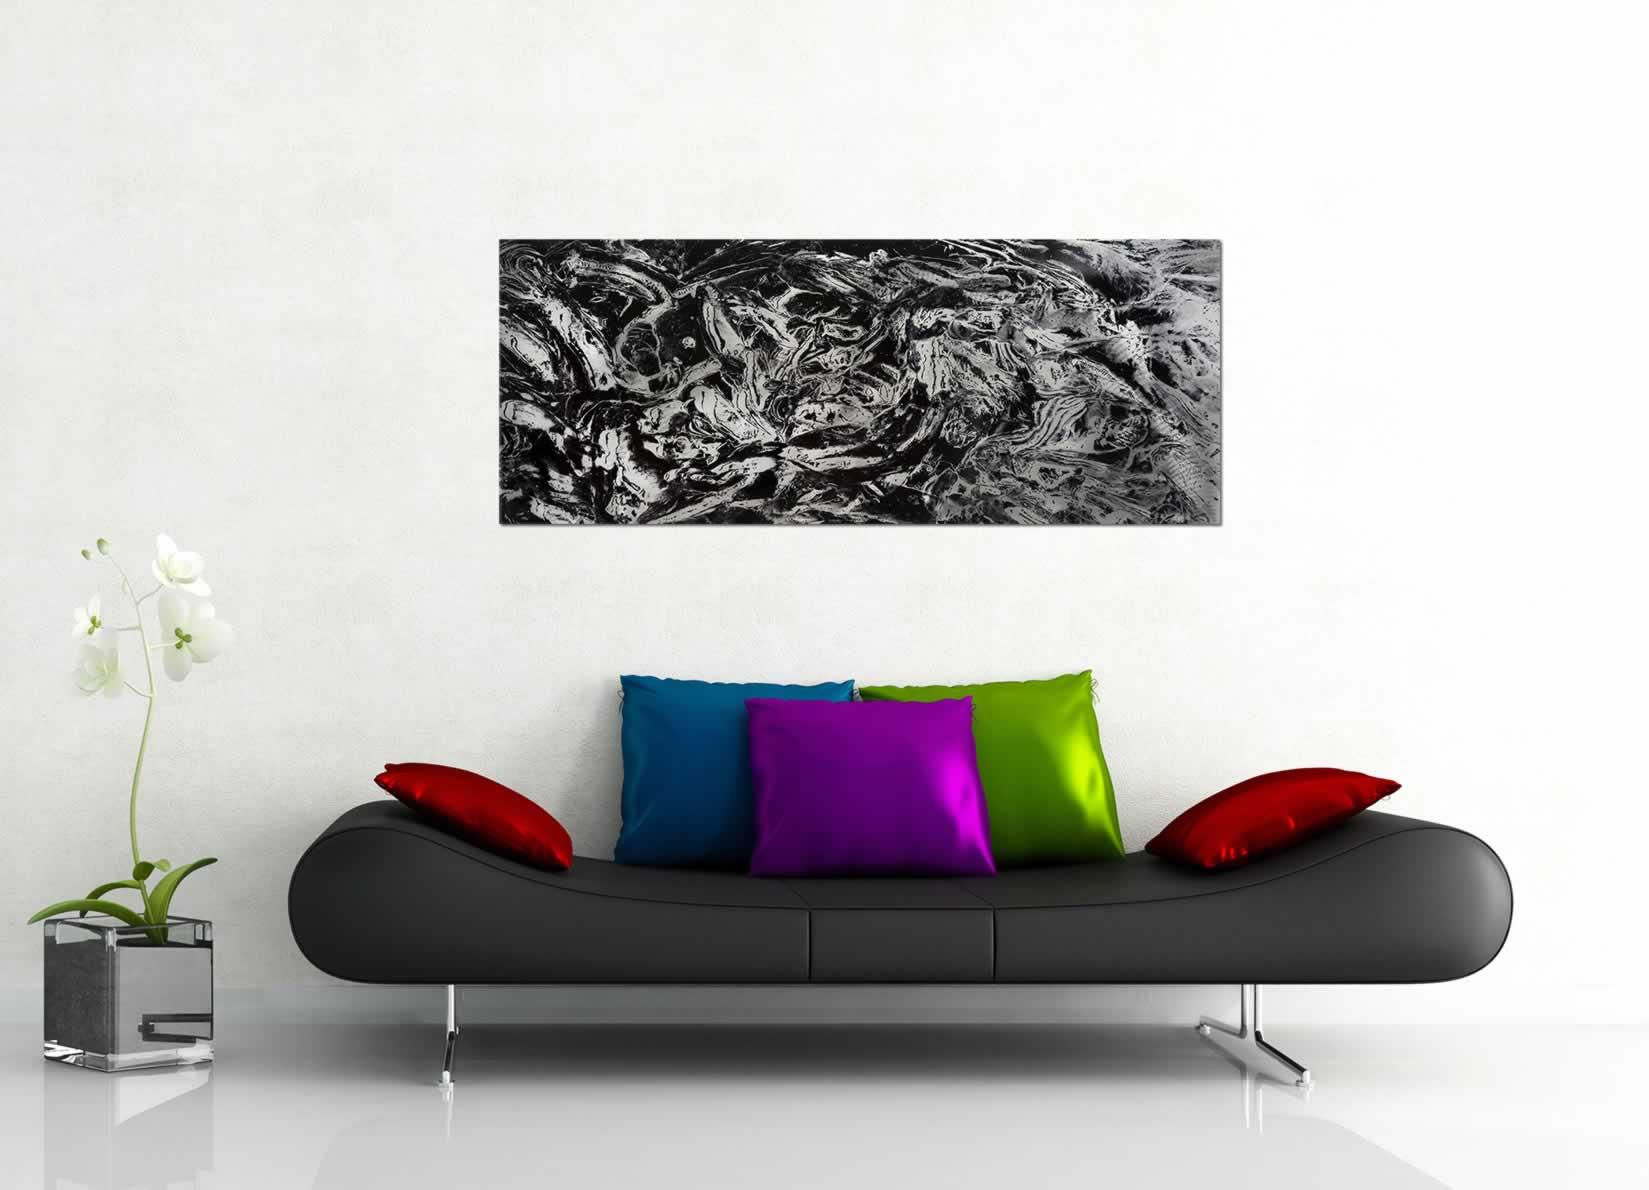 Convex - Black & White Paint-Splatter Abstract Art - Lifestyle Image